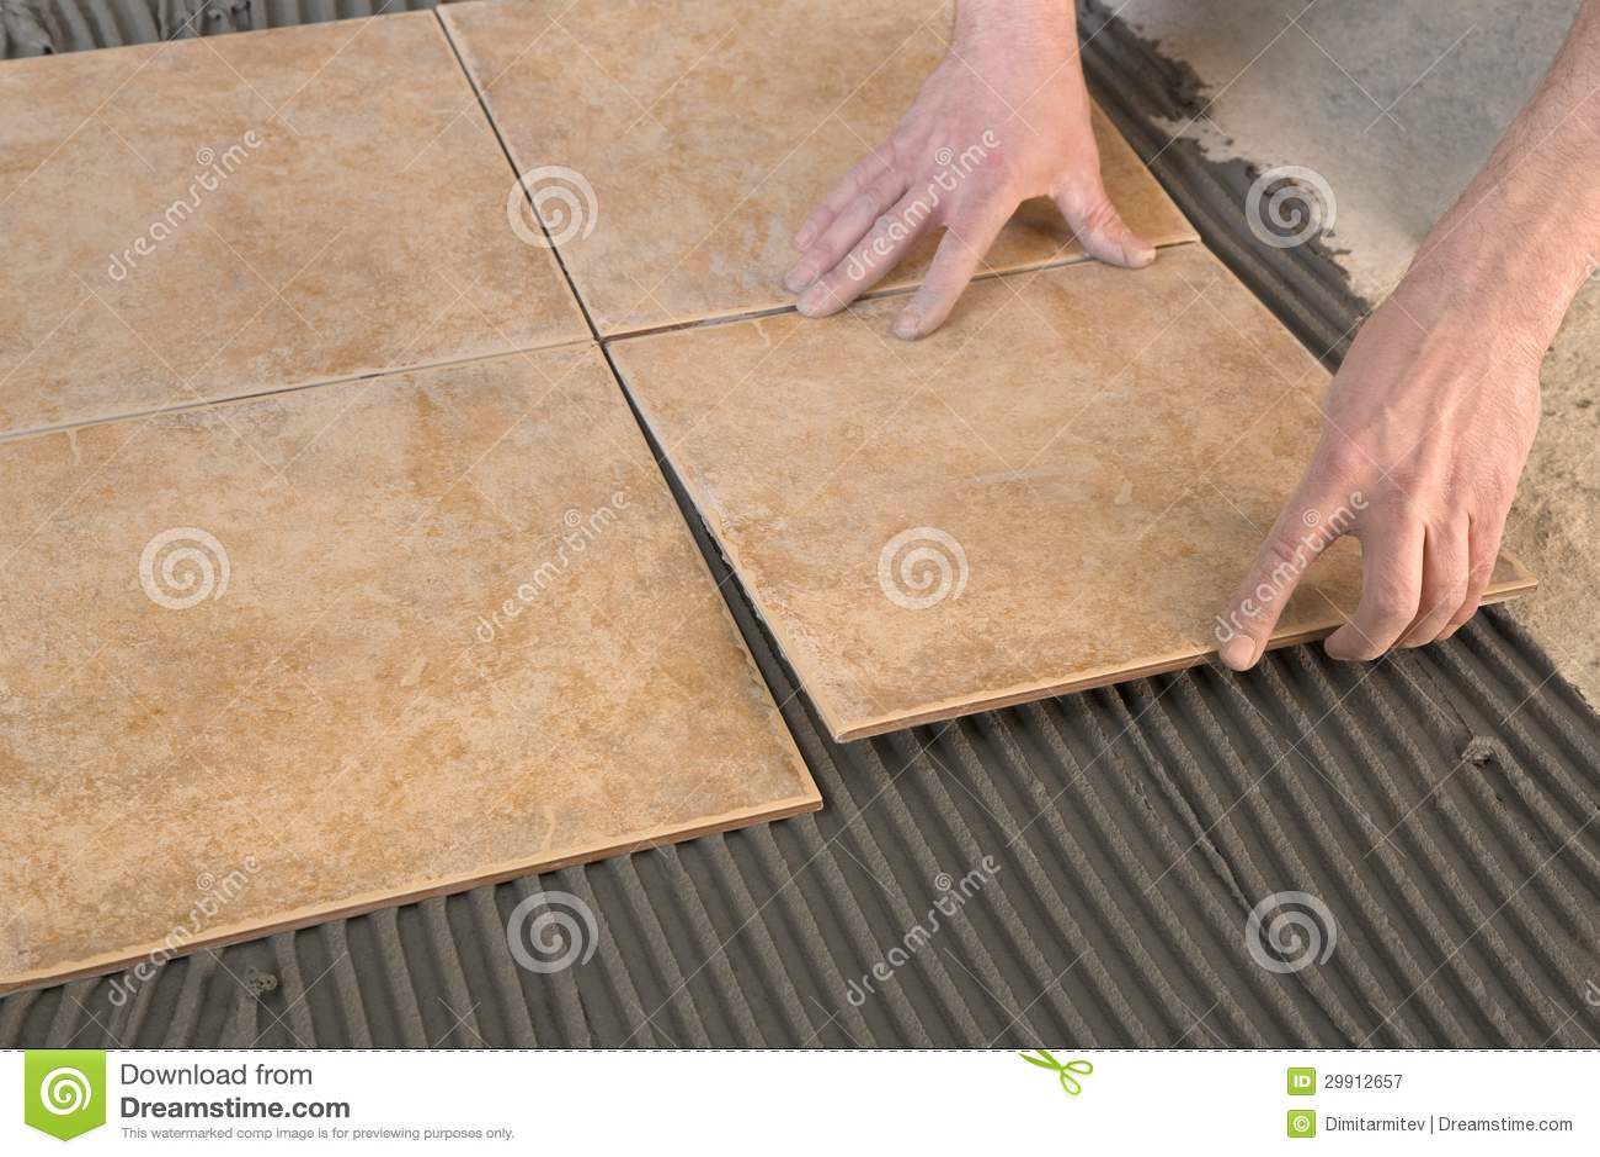 Builder floor tiles installed royalty free stock for Builder s pride flooring